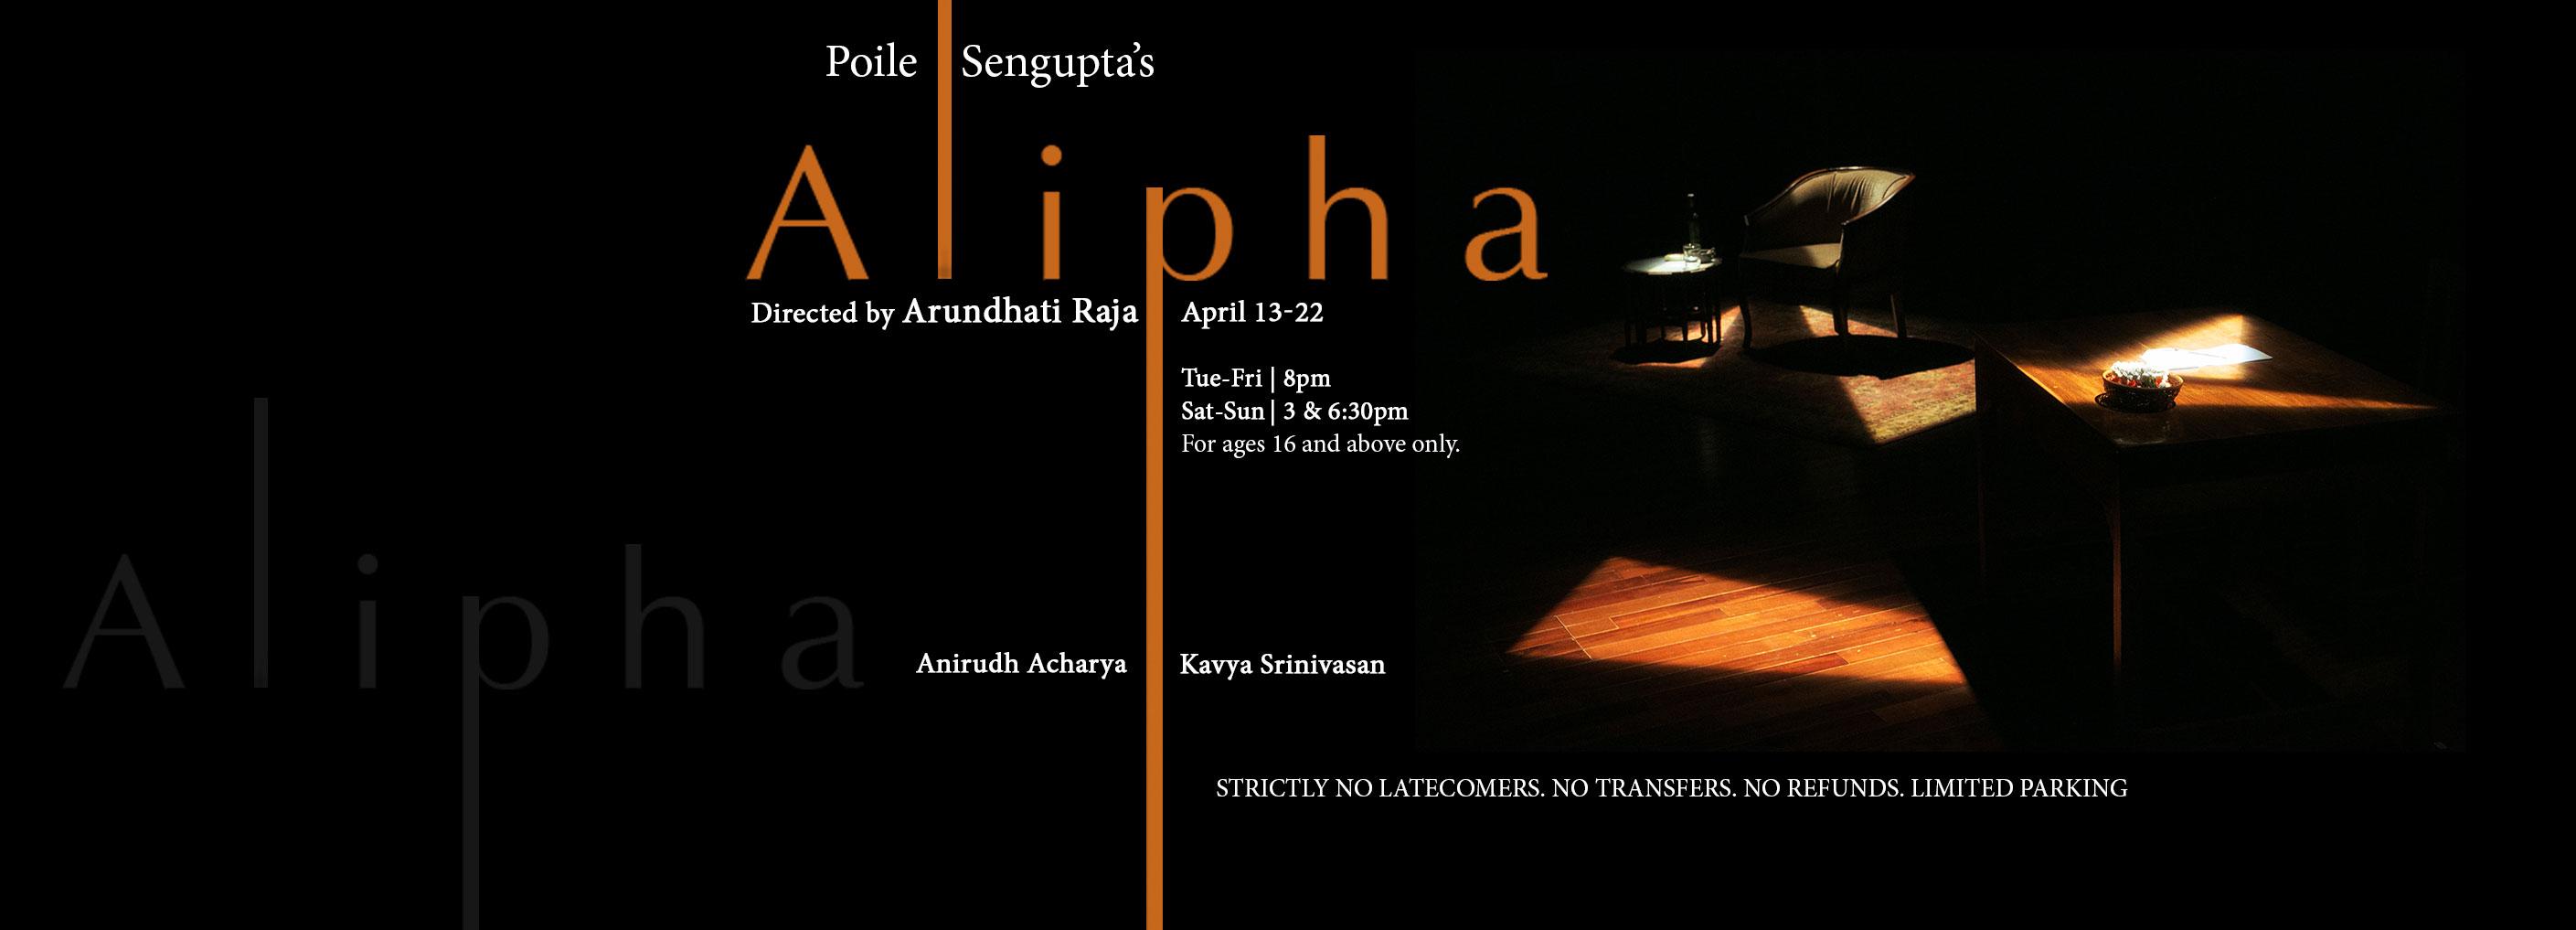 Alipha